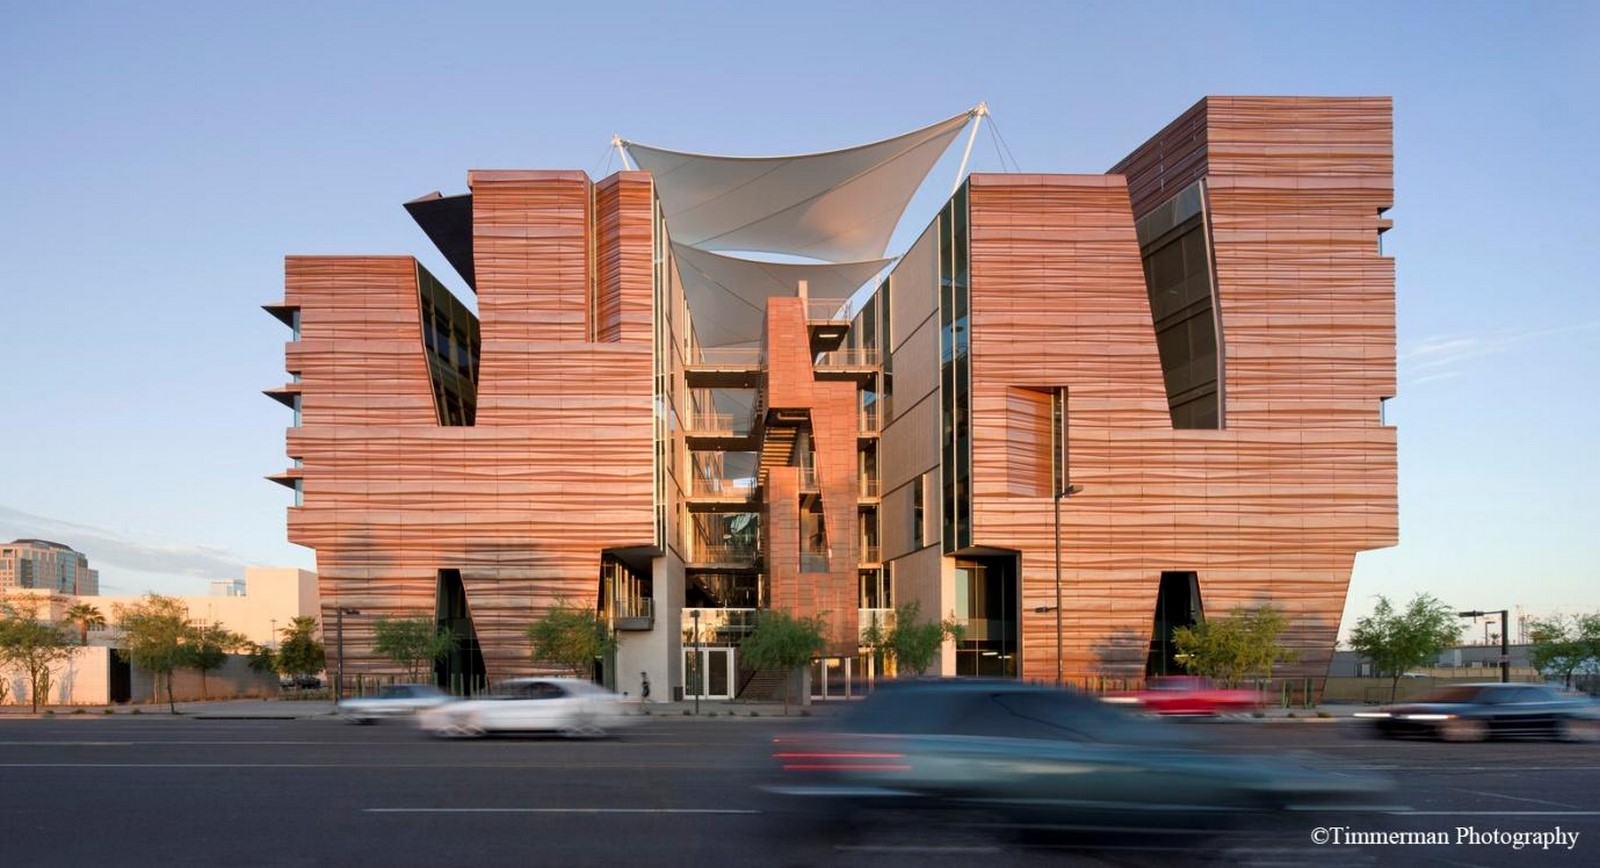 Phoenix Biomedical Campus: Health Sciences Education Building, Arizona- sheet2